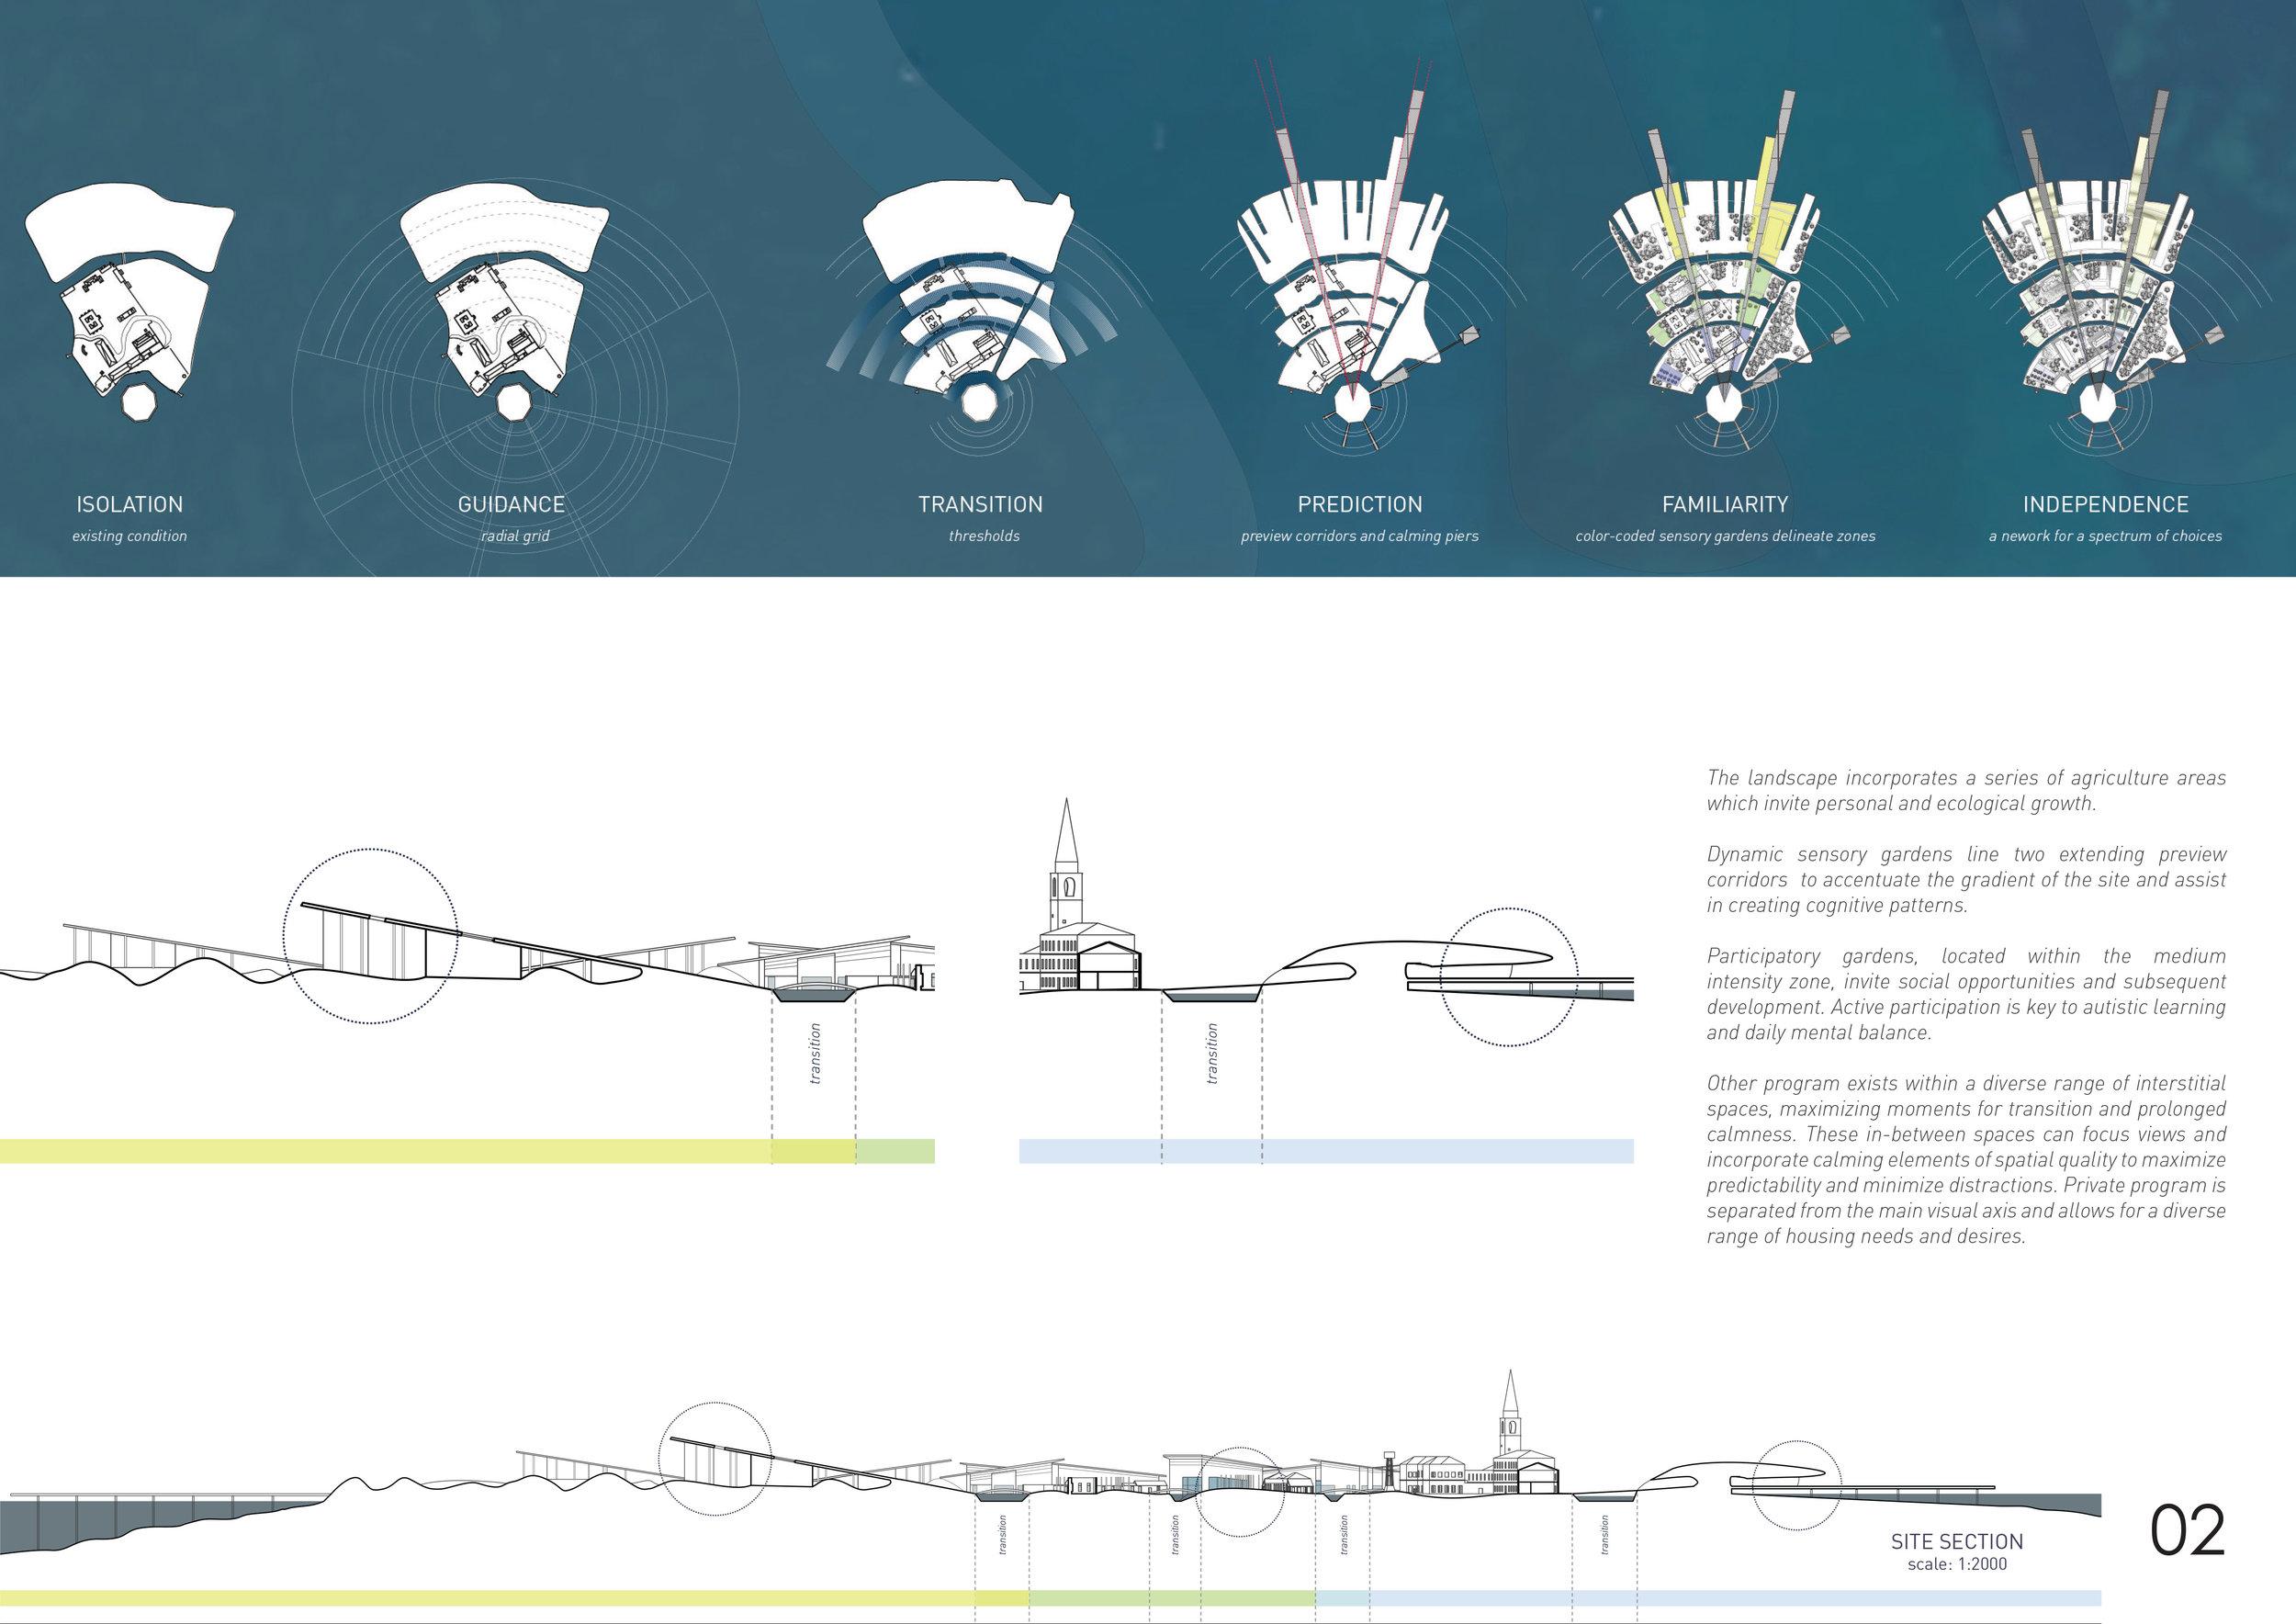 Univeristy Island Gradient Matt Fajkus Architecture MF MFx16_2.jpg